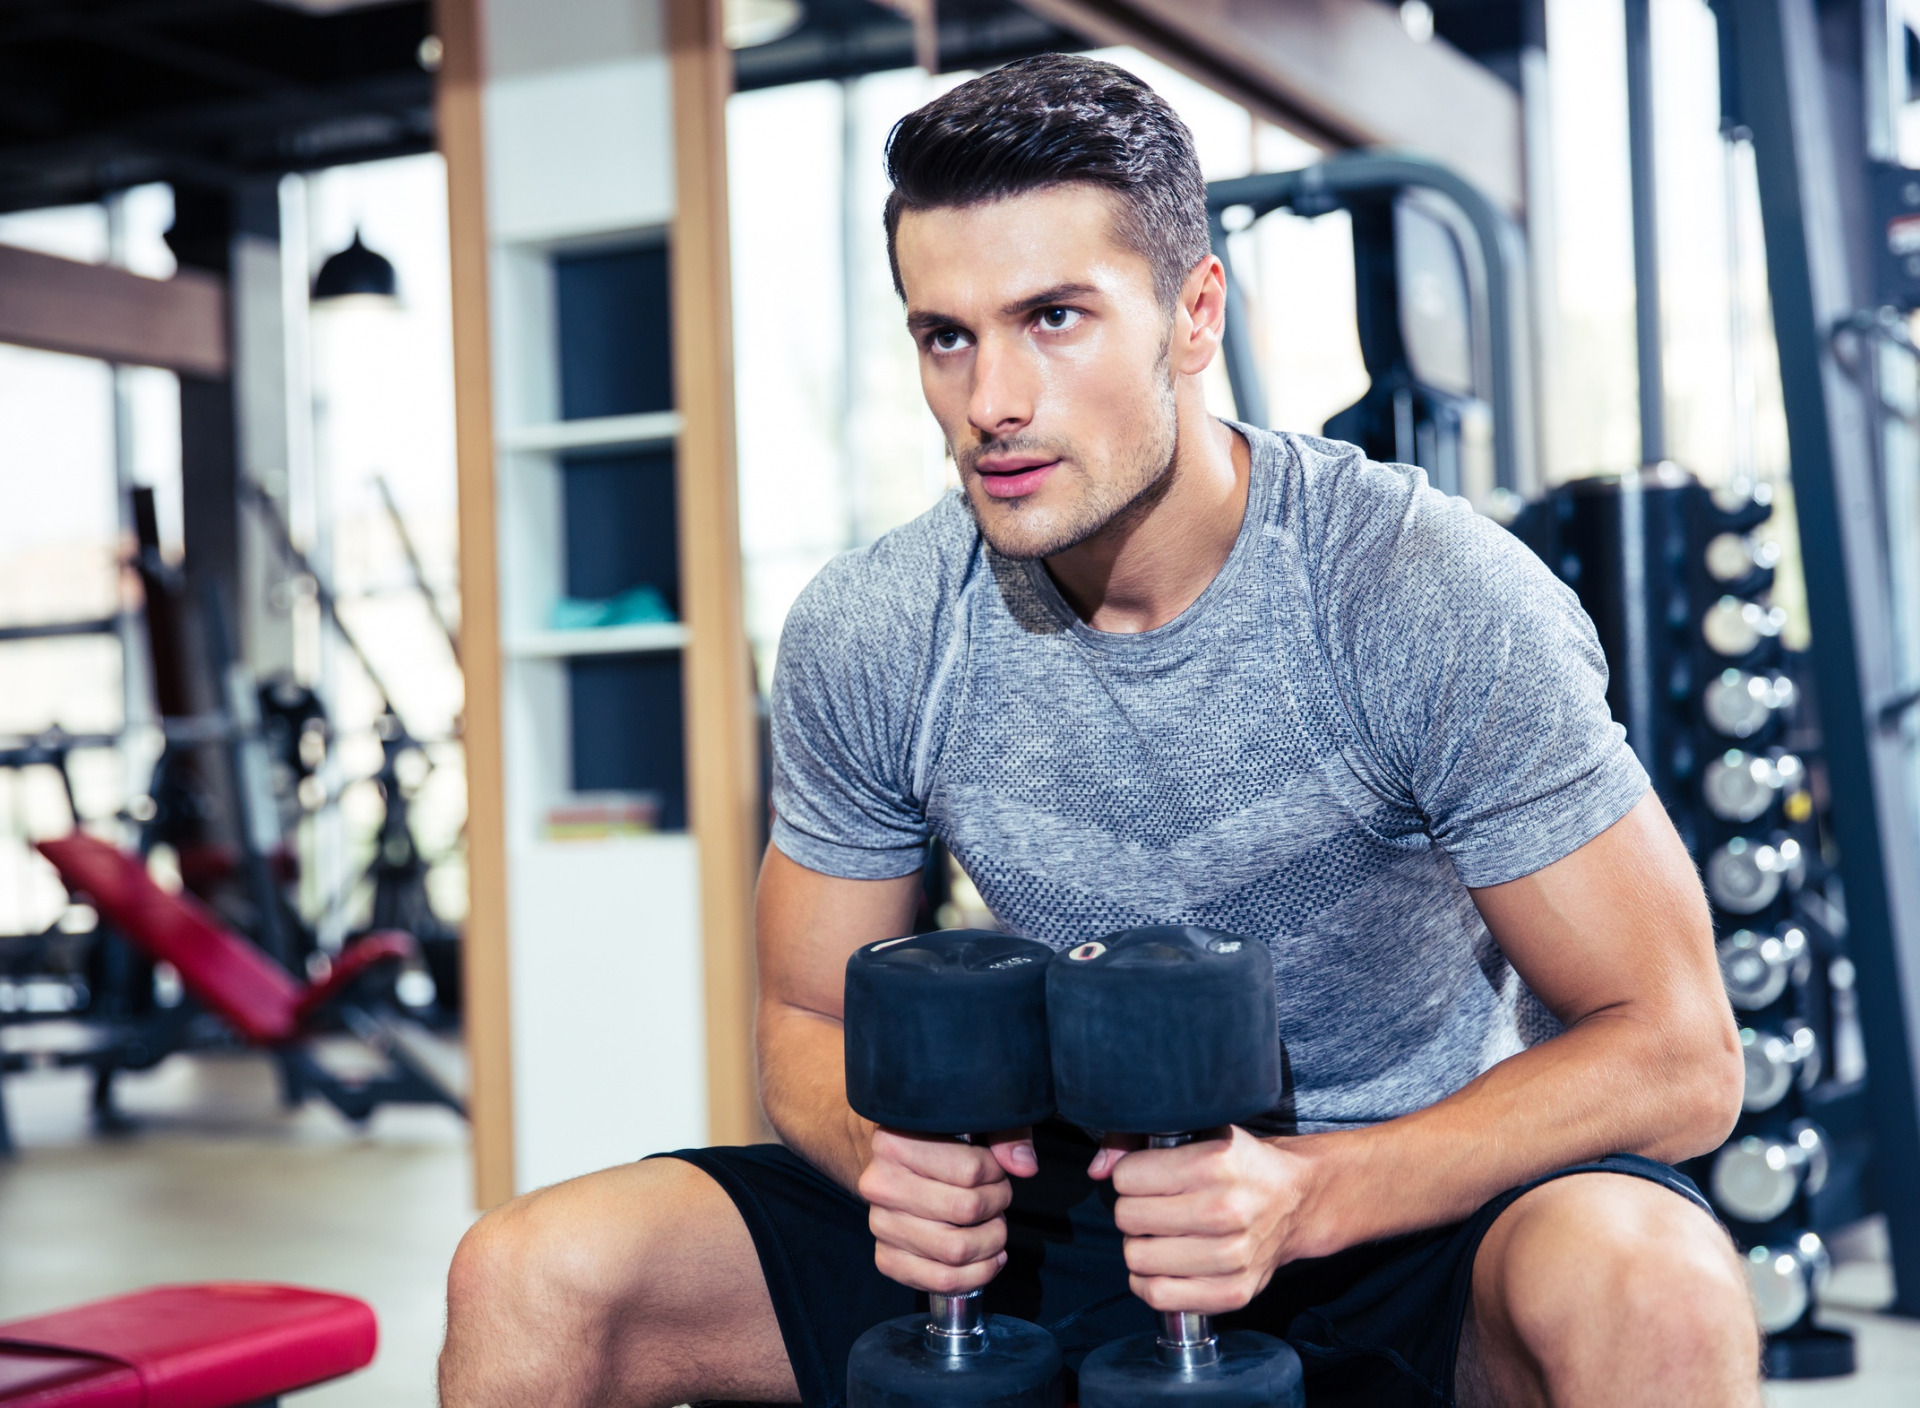 Картинки спорт для мужчин